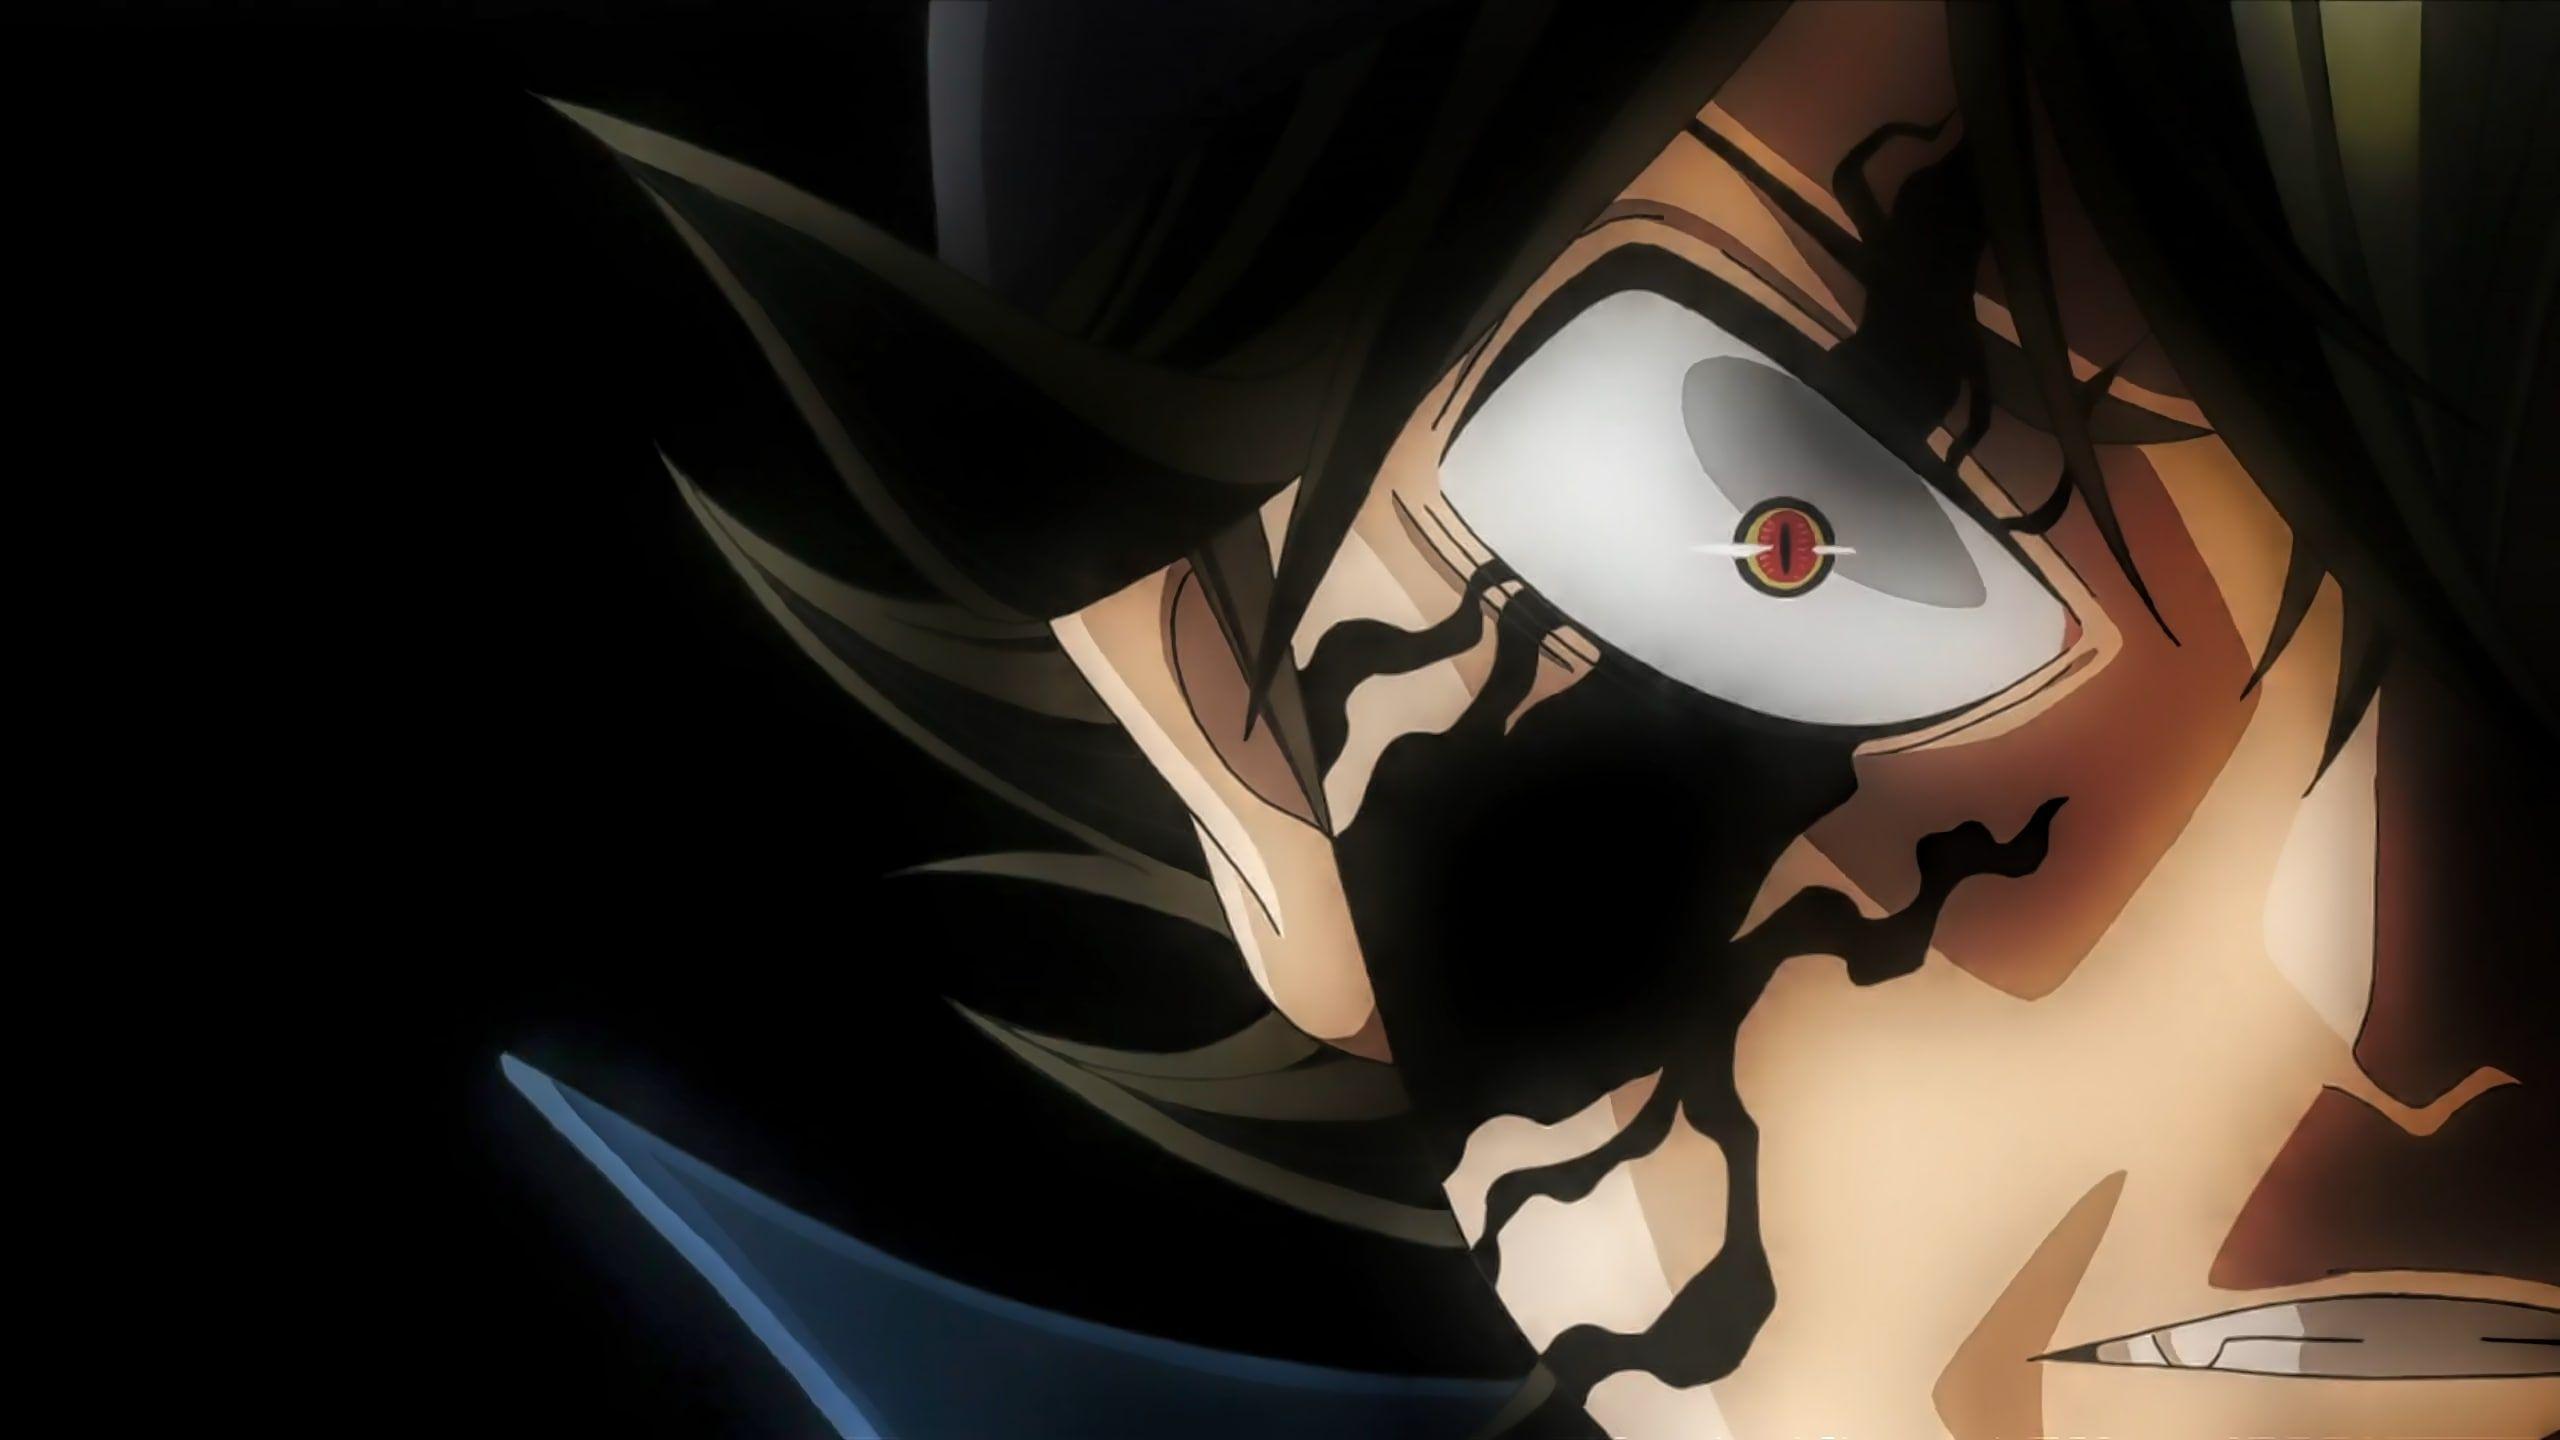 Asta Wallpapers HD | Black clover anime, Hd wallpaper ...